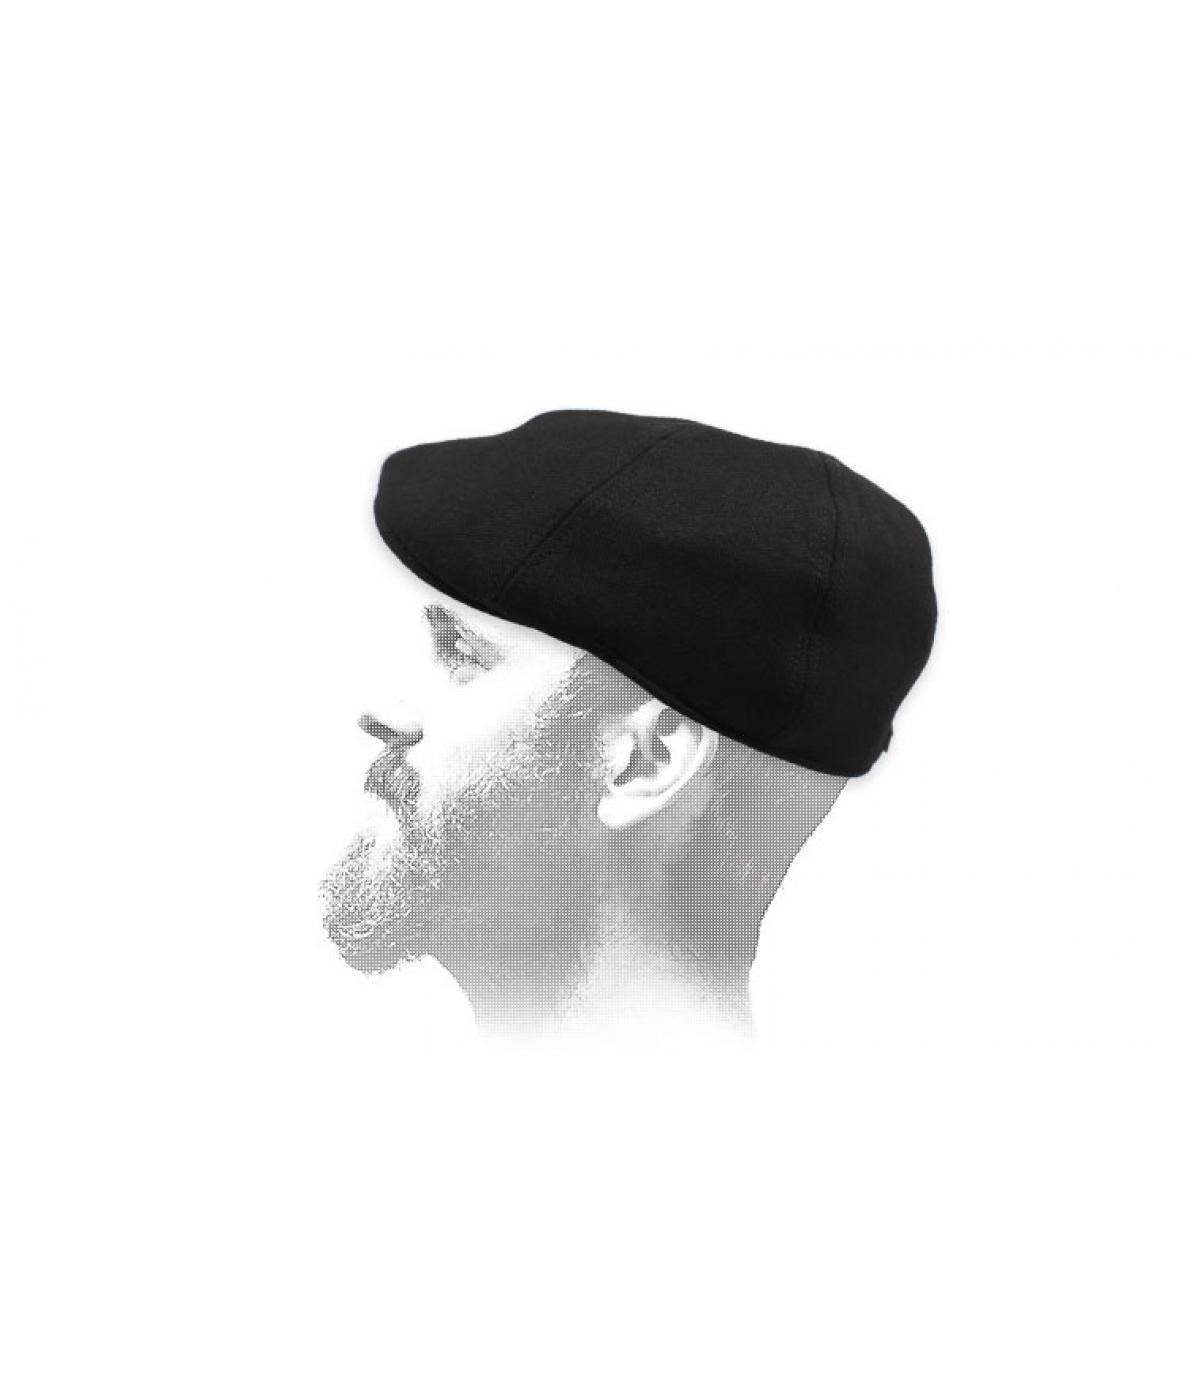 black wool duckbill cap